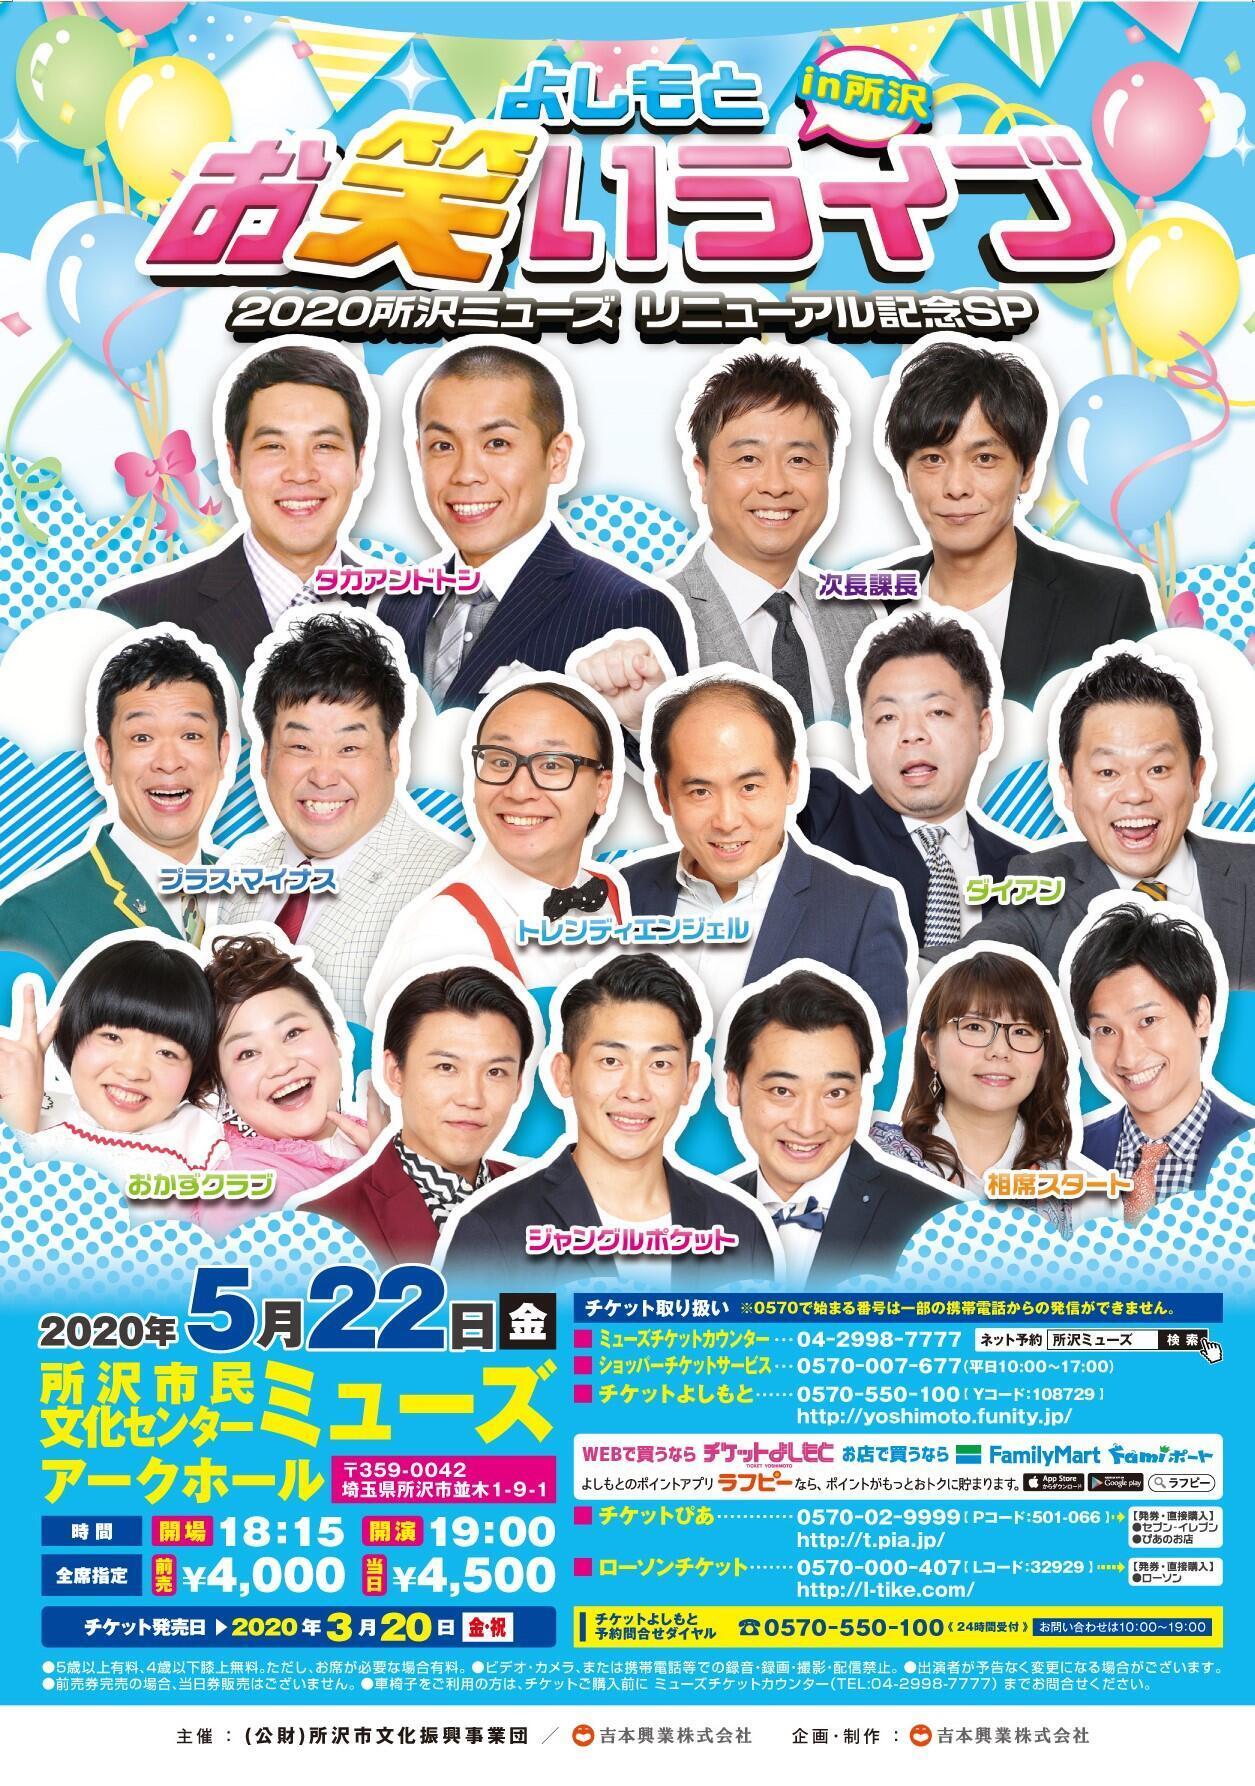 http://www.syumatsu.jp/20200311144232-6805db40ba79552f53f2a844e7bb7ba512470f45.jpg